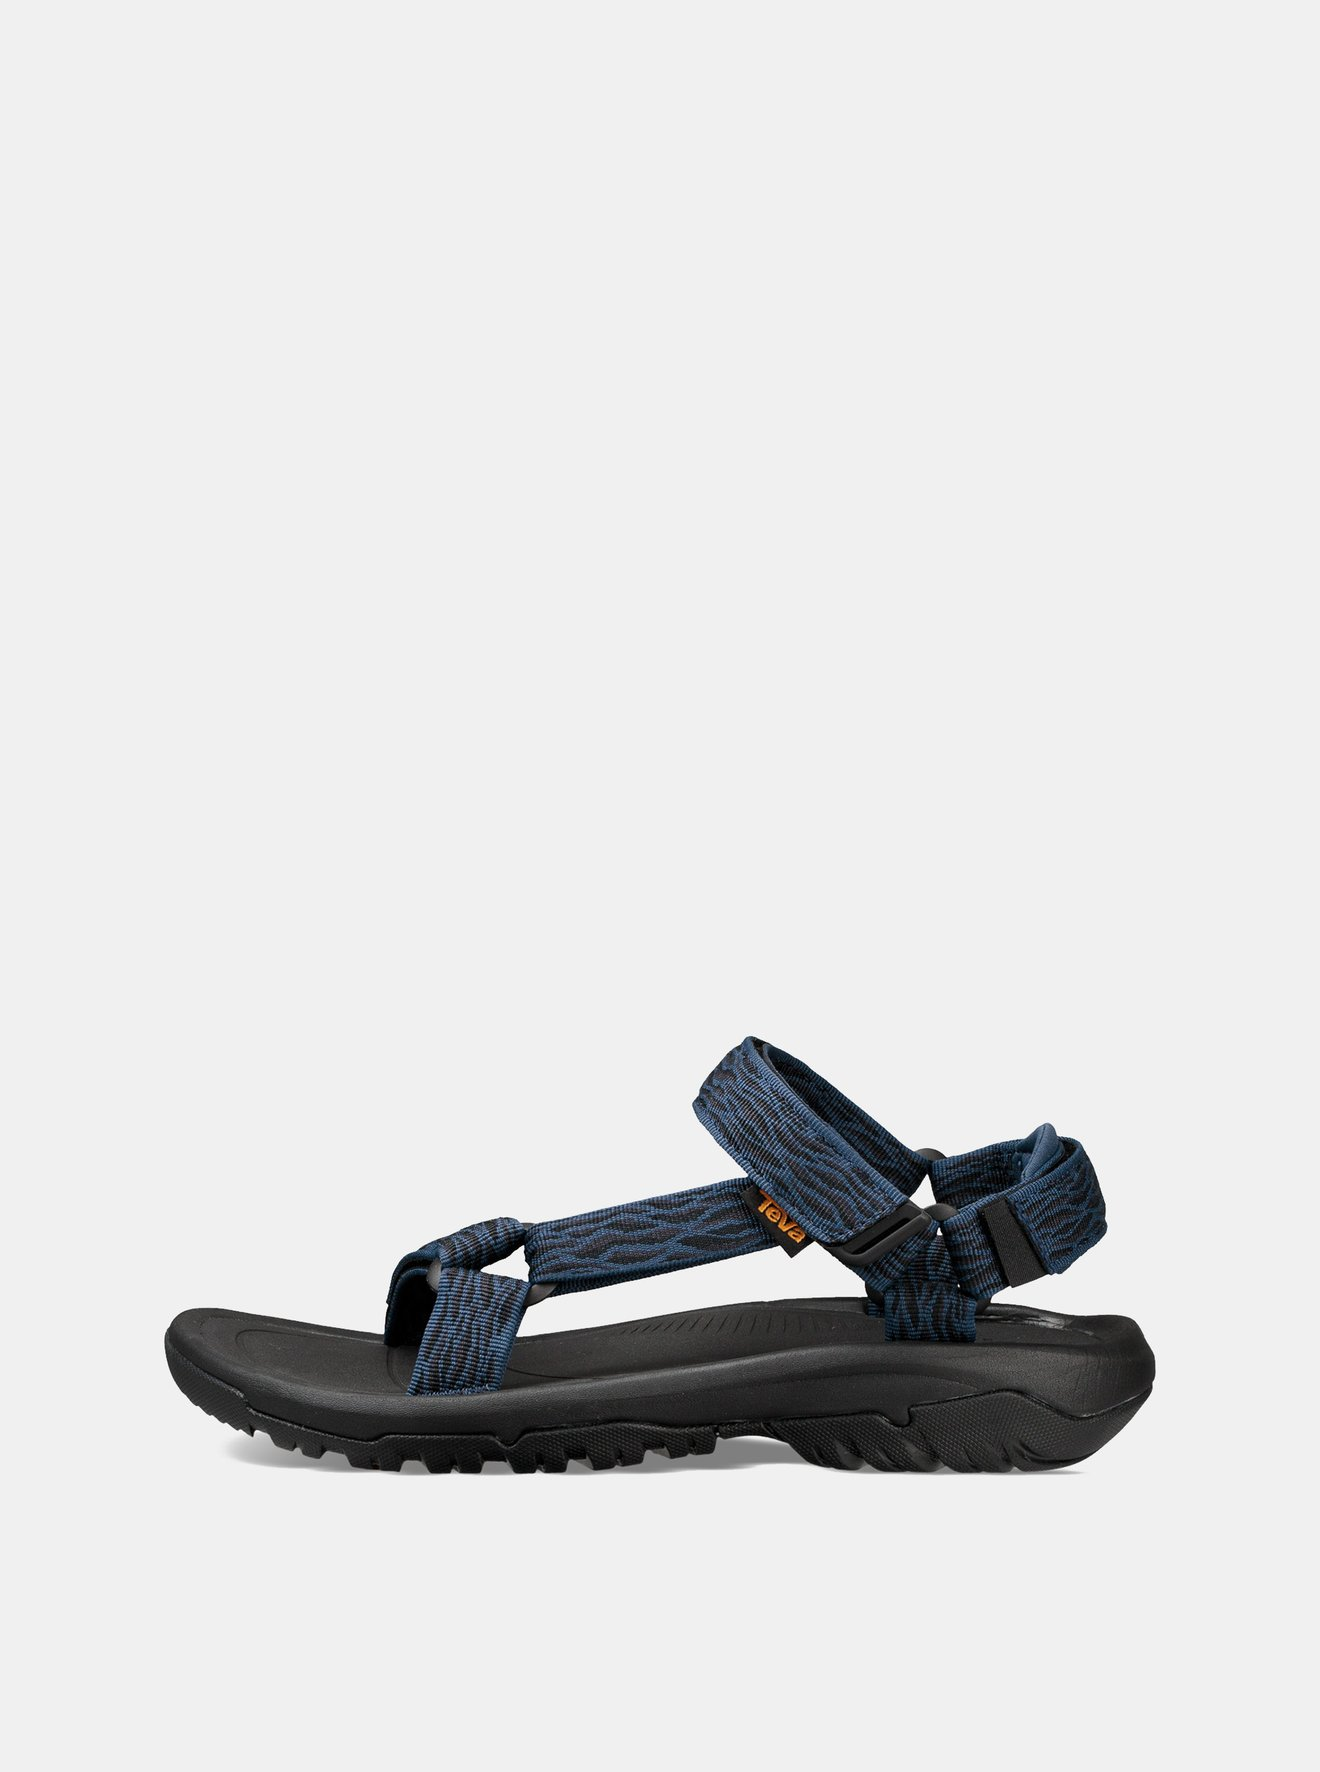 Tmavě modré pánské vzorované sandály Teva